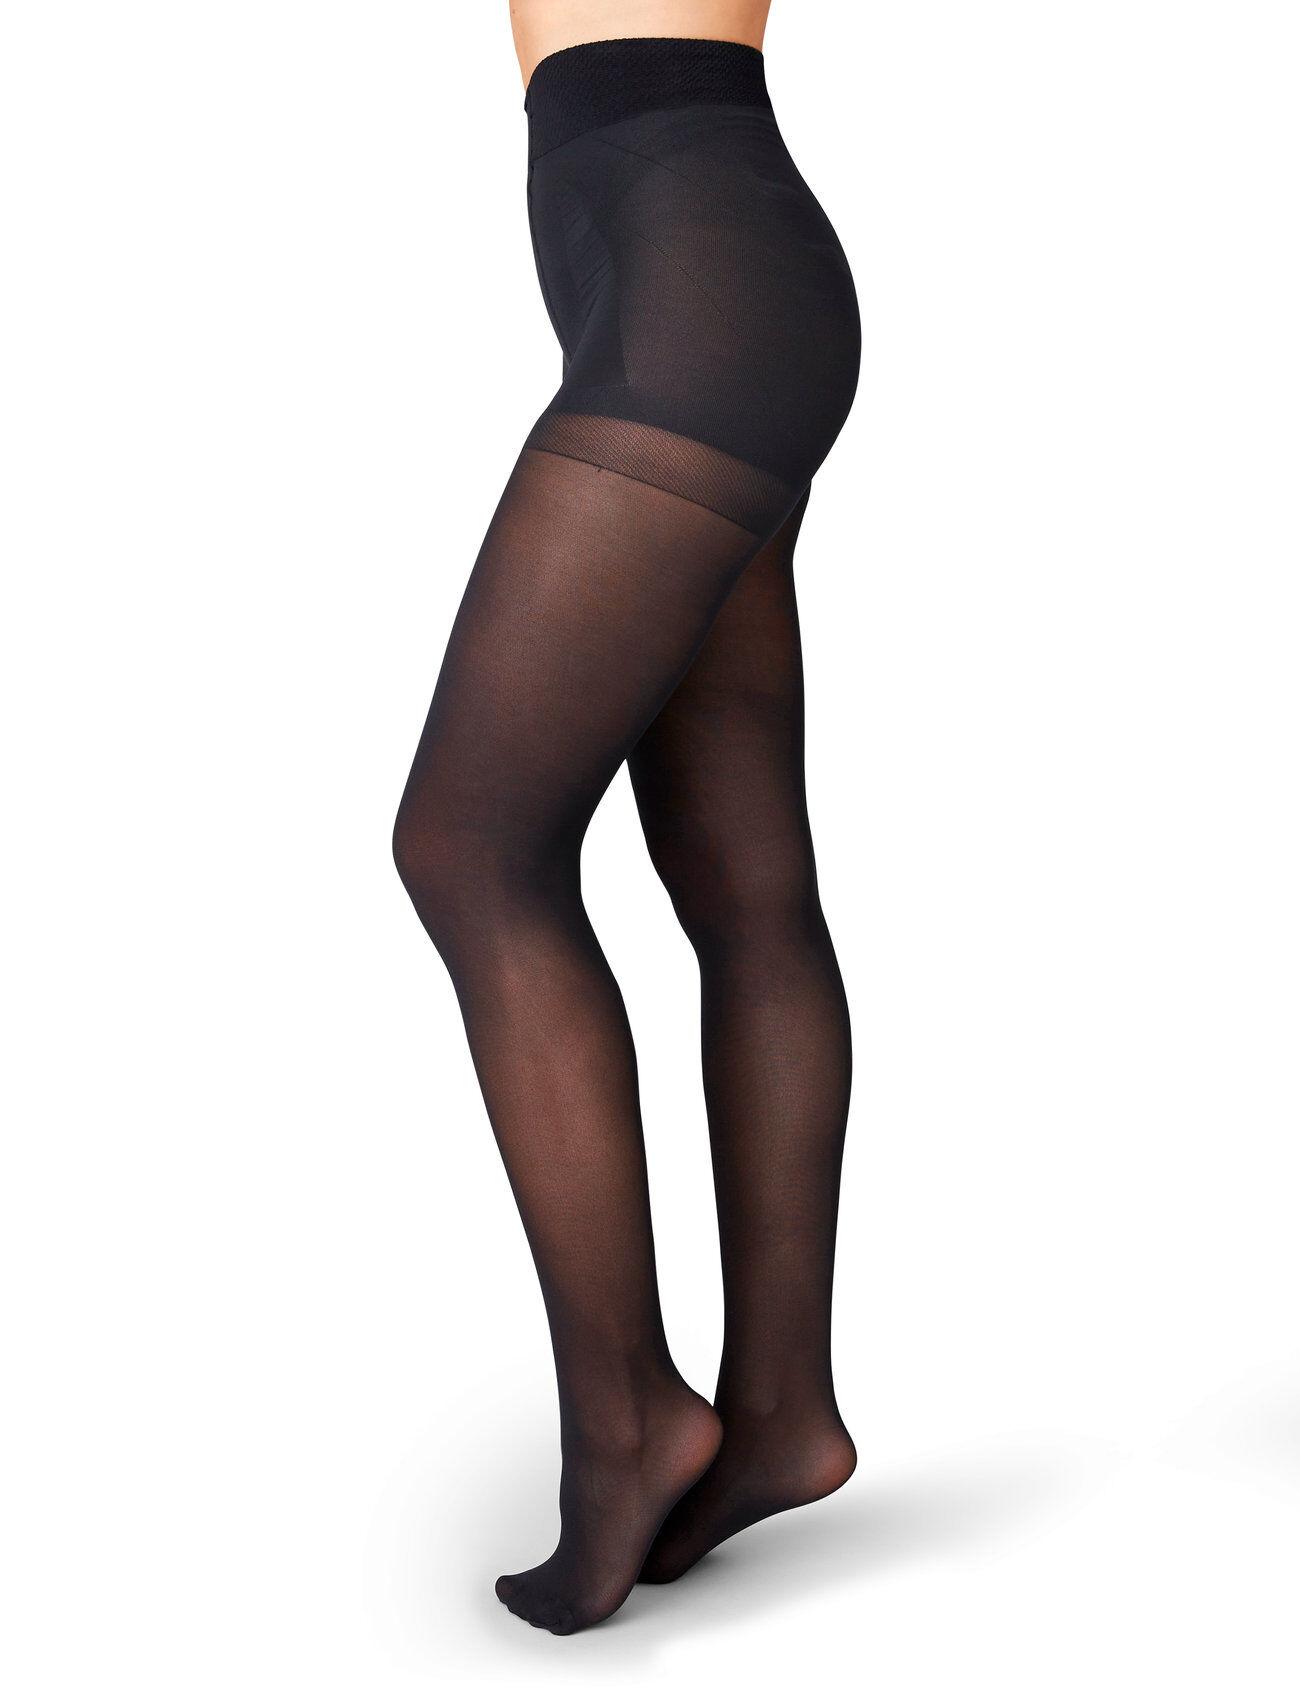 Swedish Stockings Anna Control Top Tights 40d Sukkahousut Musta Swedish Stockings